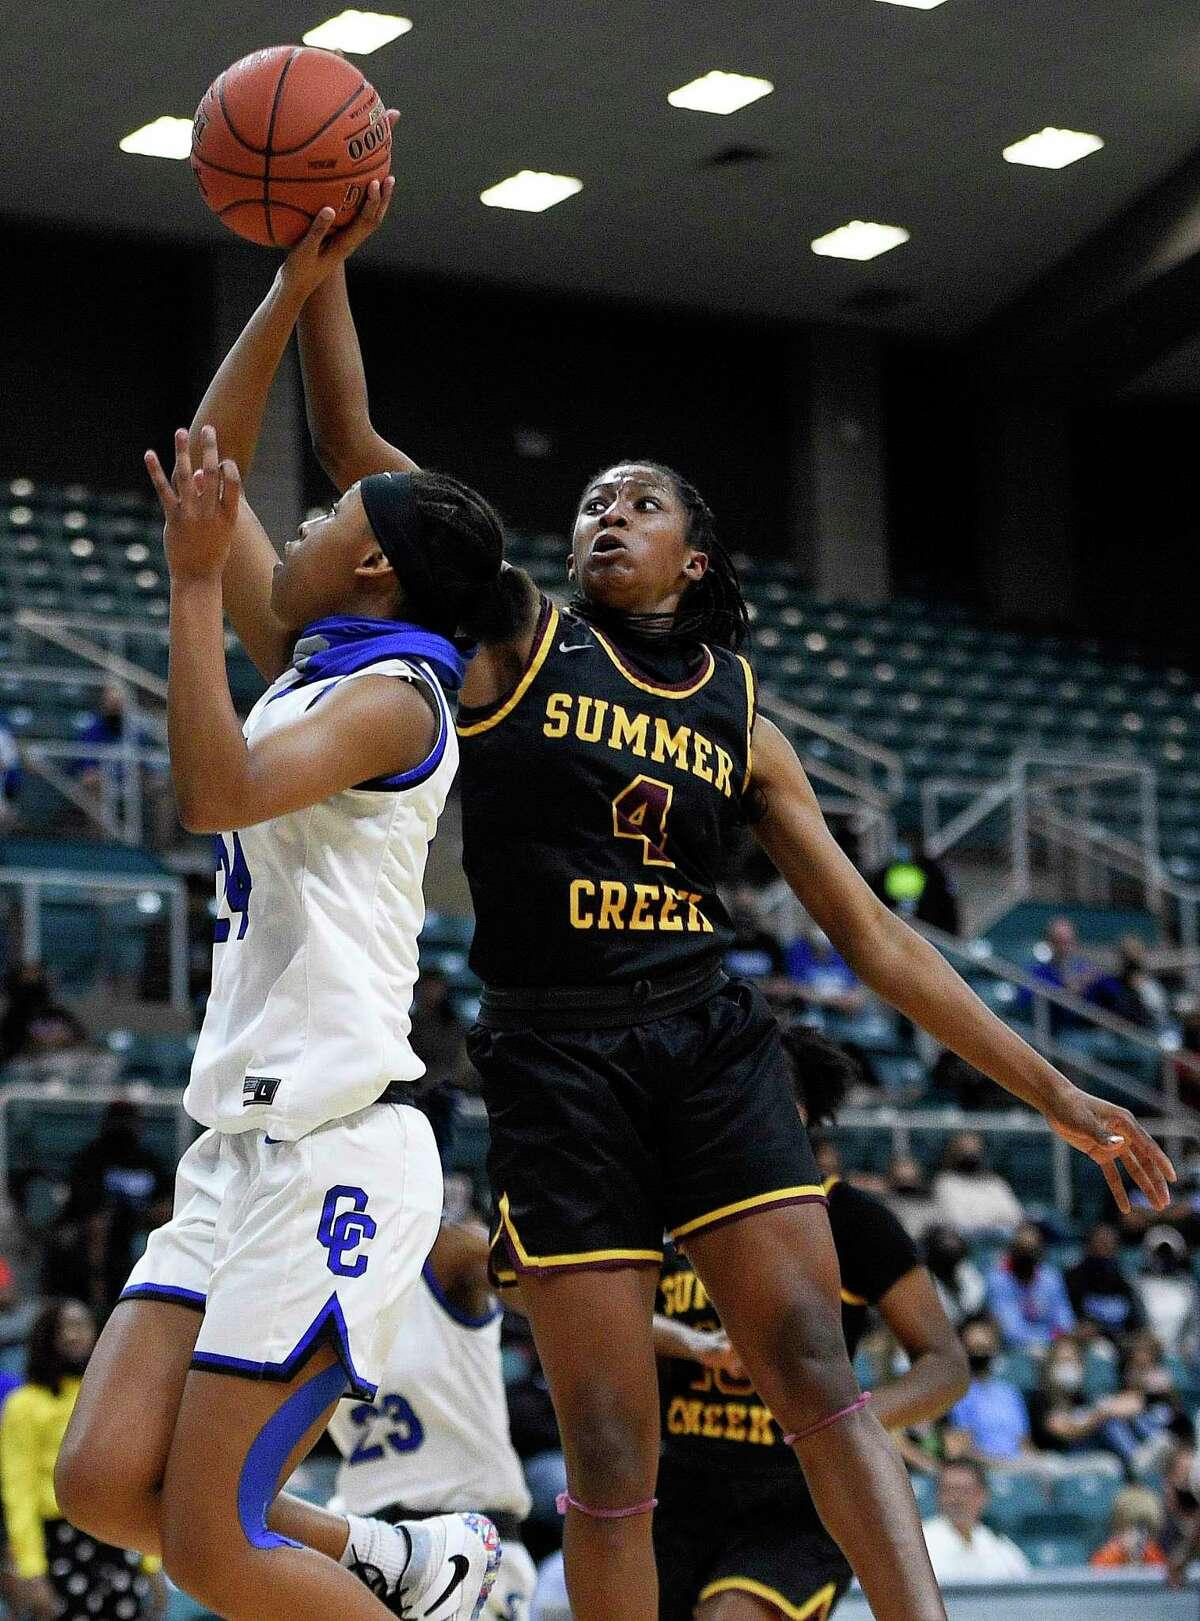 Summer Creek forward Kaitlyn Duhon (4) blocks the shot of Cypress Creek guard Krishawn Lee during the first half of a 6A Region III semifinal high school basketball playoff game, Friday, Feb. 26, 2021, in Katy, TX.